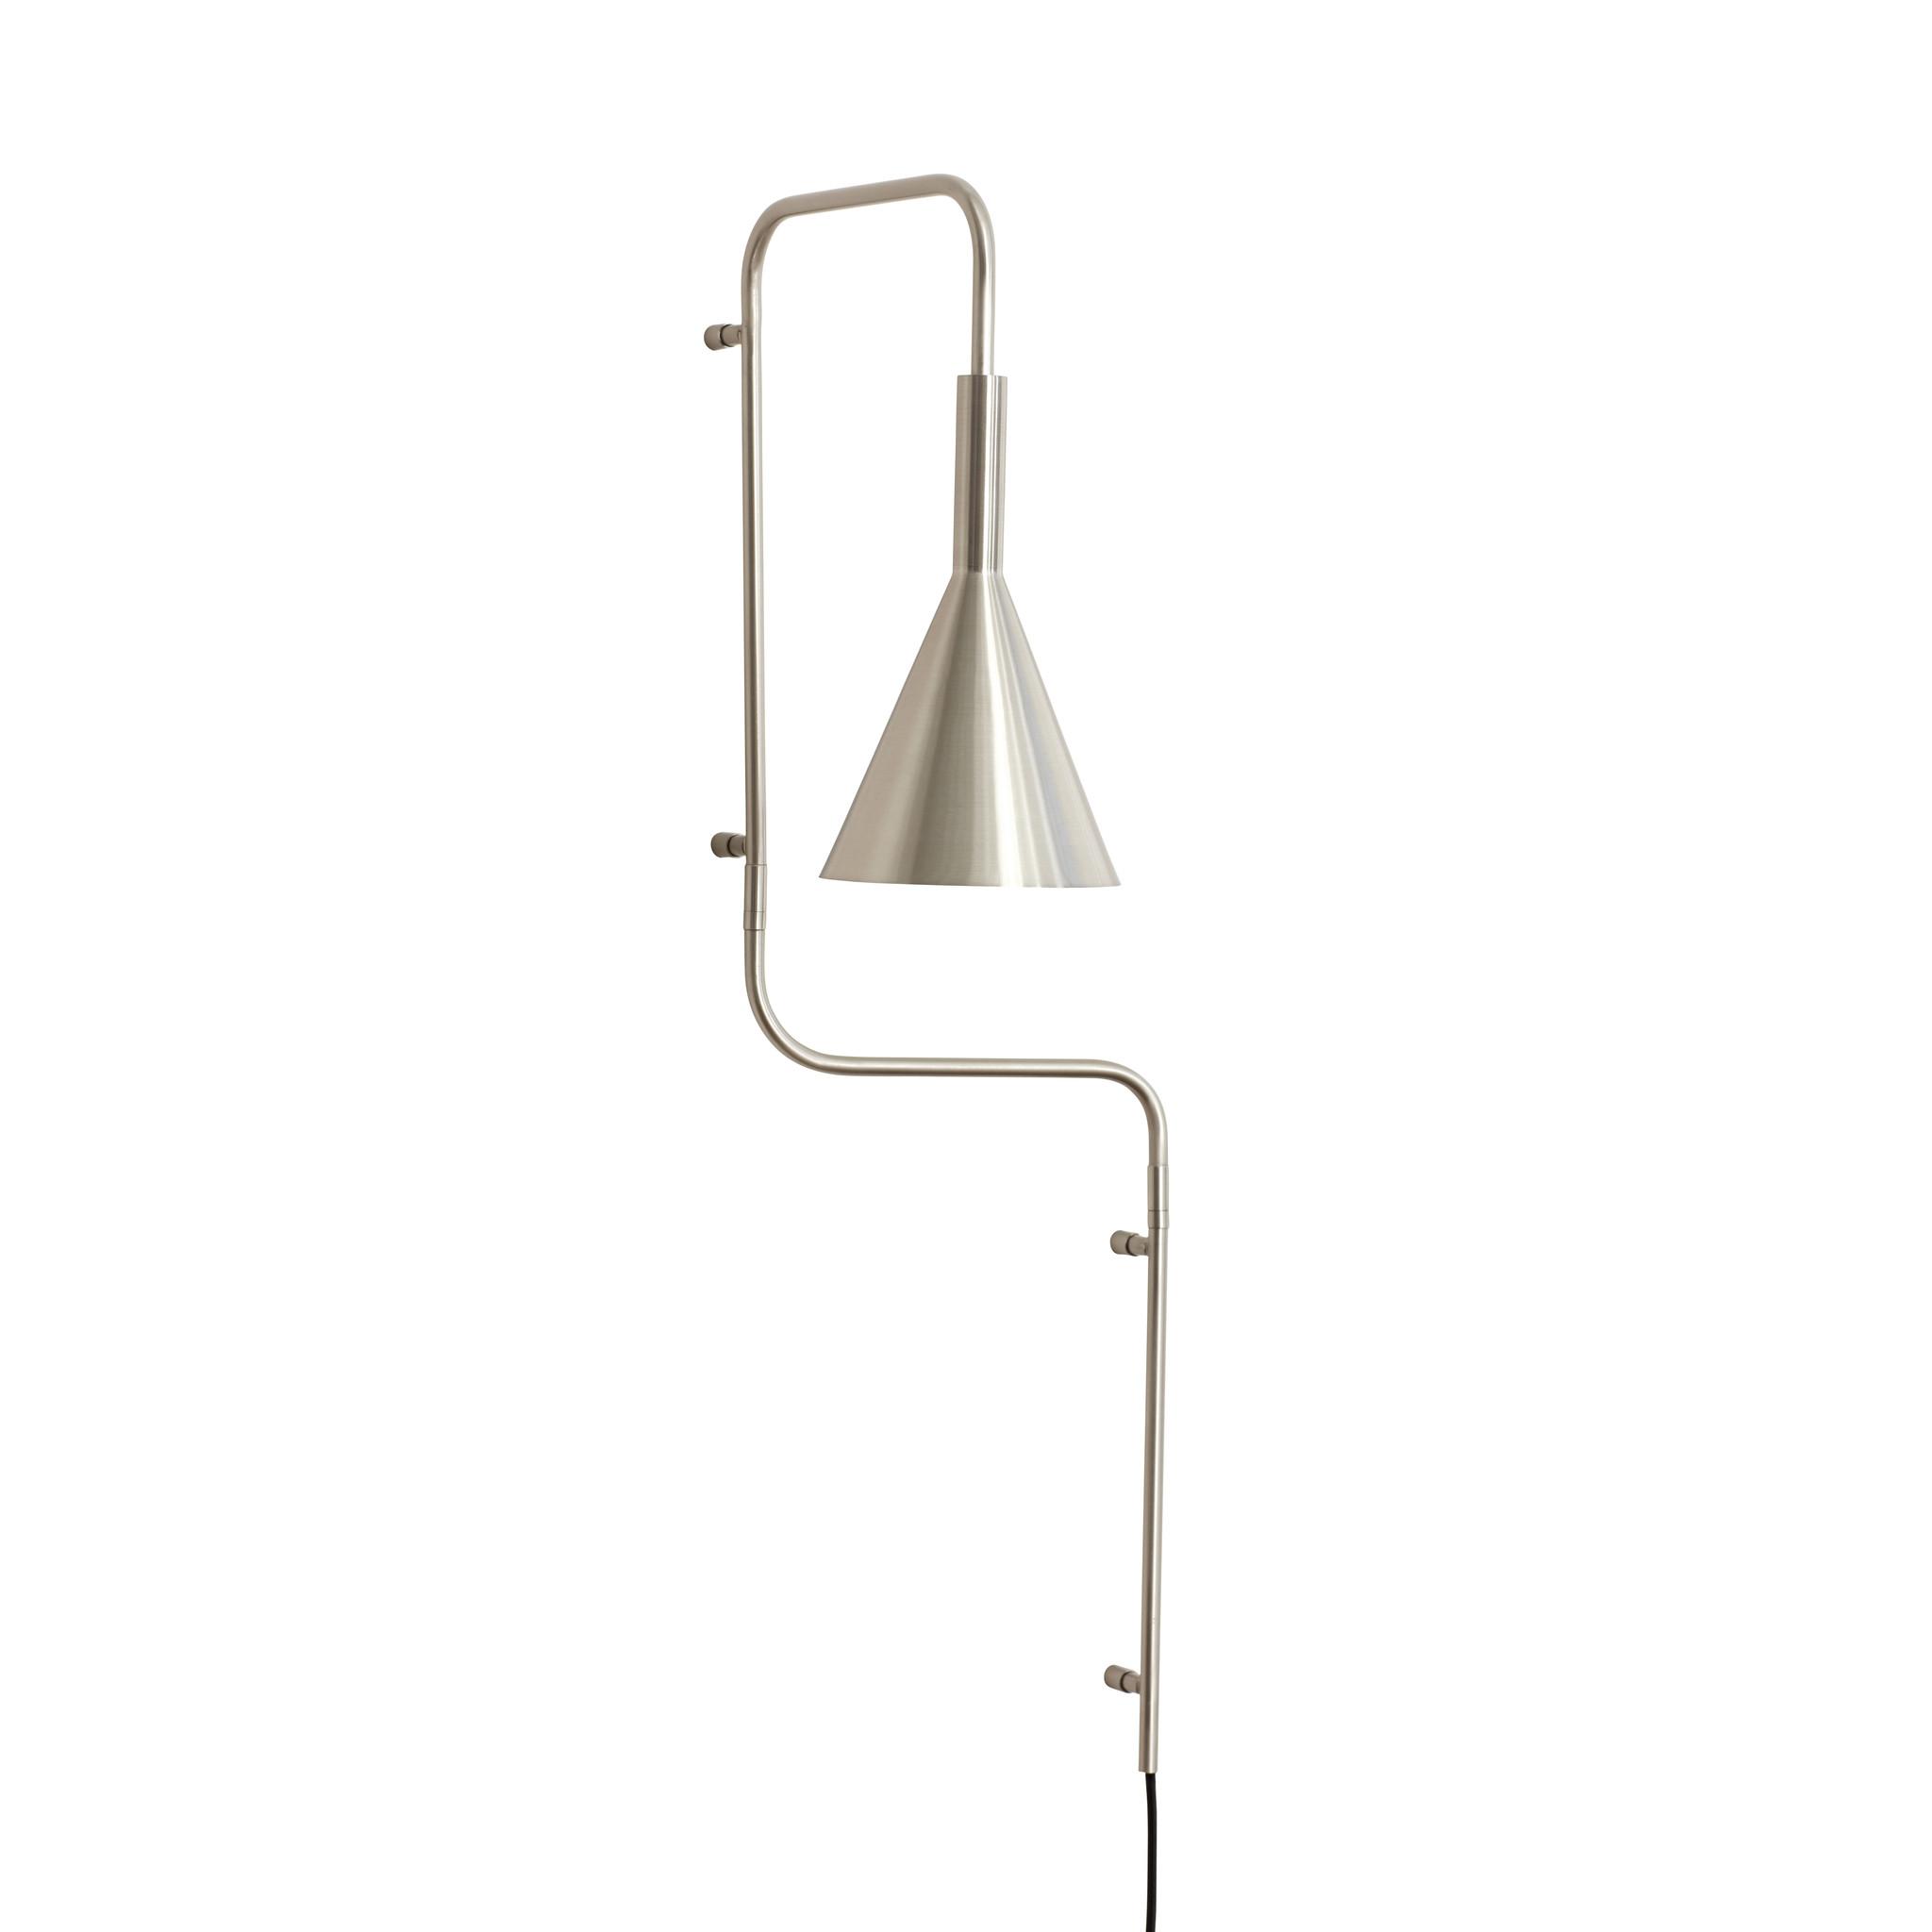 Hubsch Wandlamp, geborsteld nikkel-990929-5712772071731